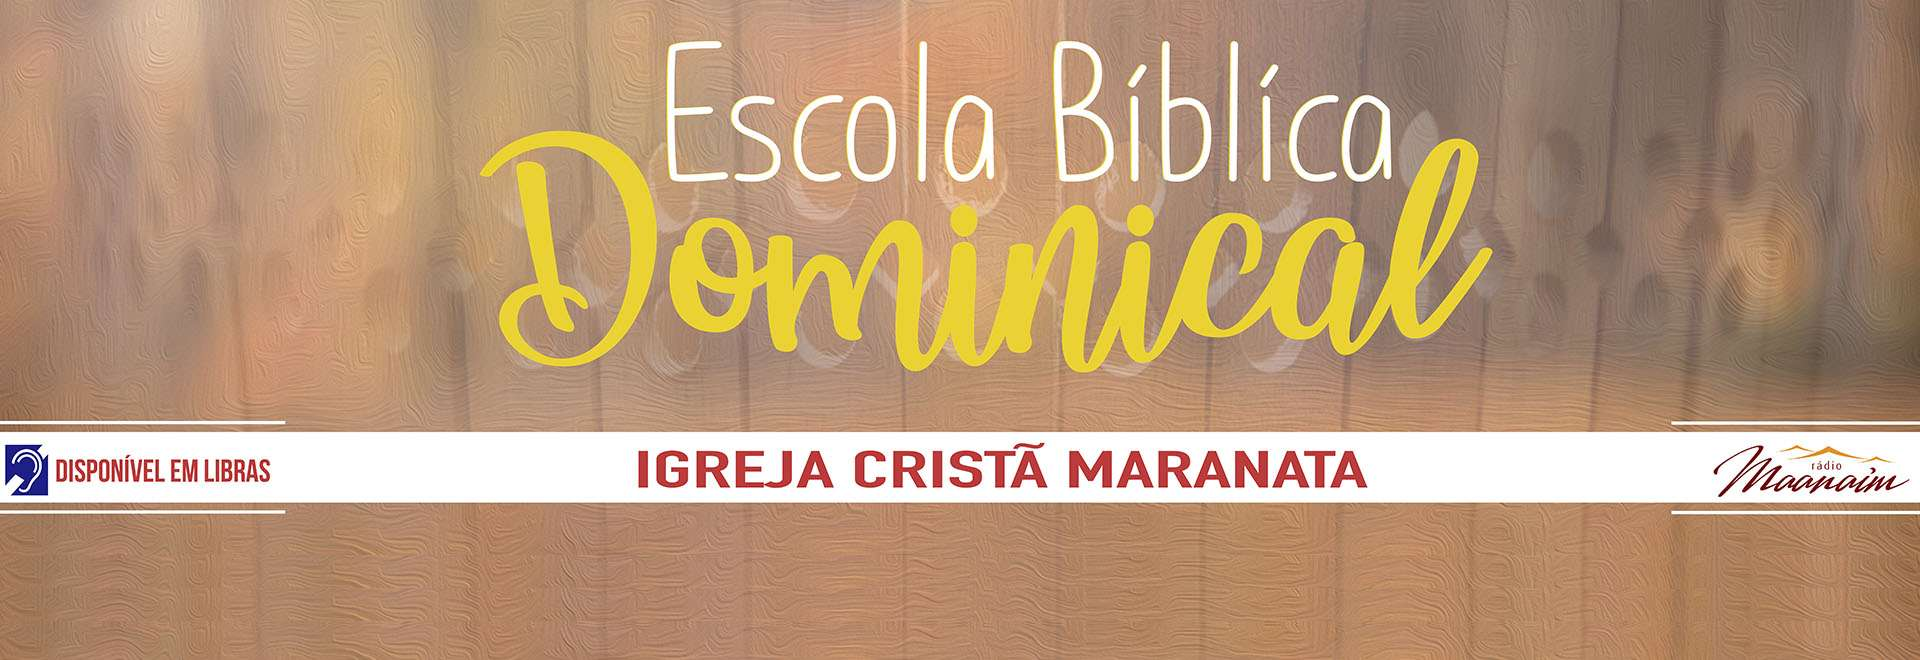 Participações da EBD da Igreja Cristã Maranata - 21/03/2021